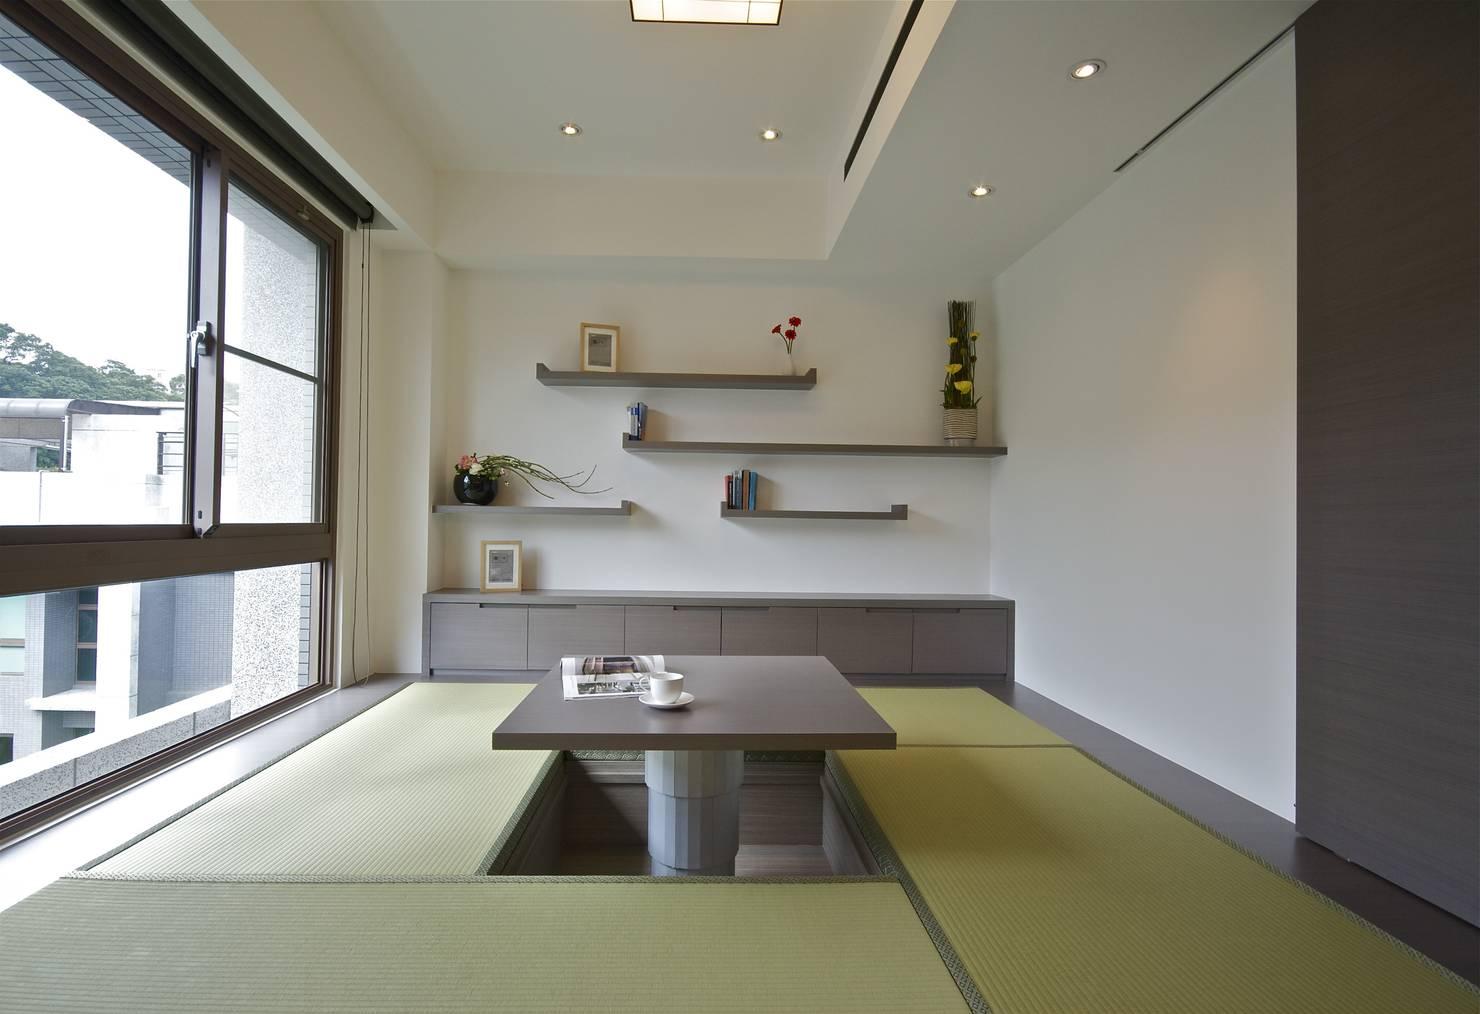 A charming minimalist home